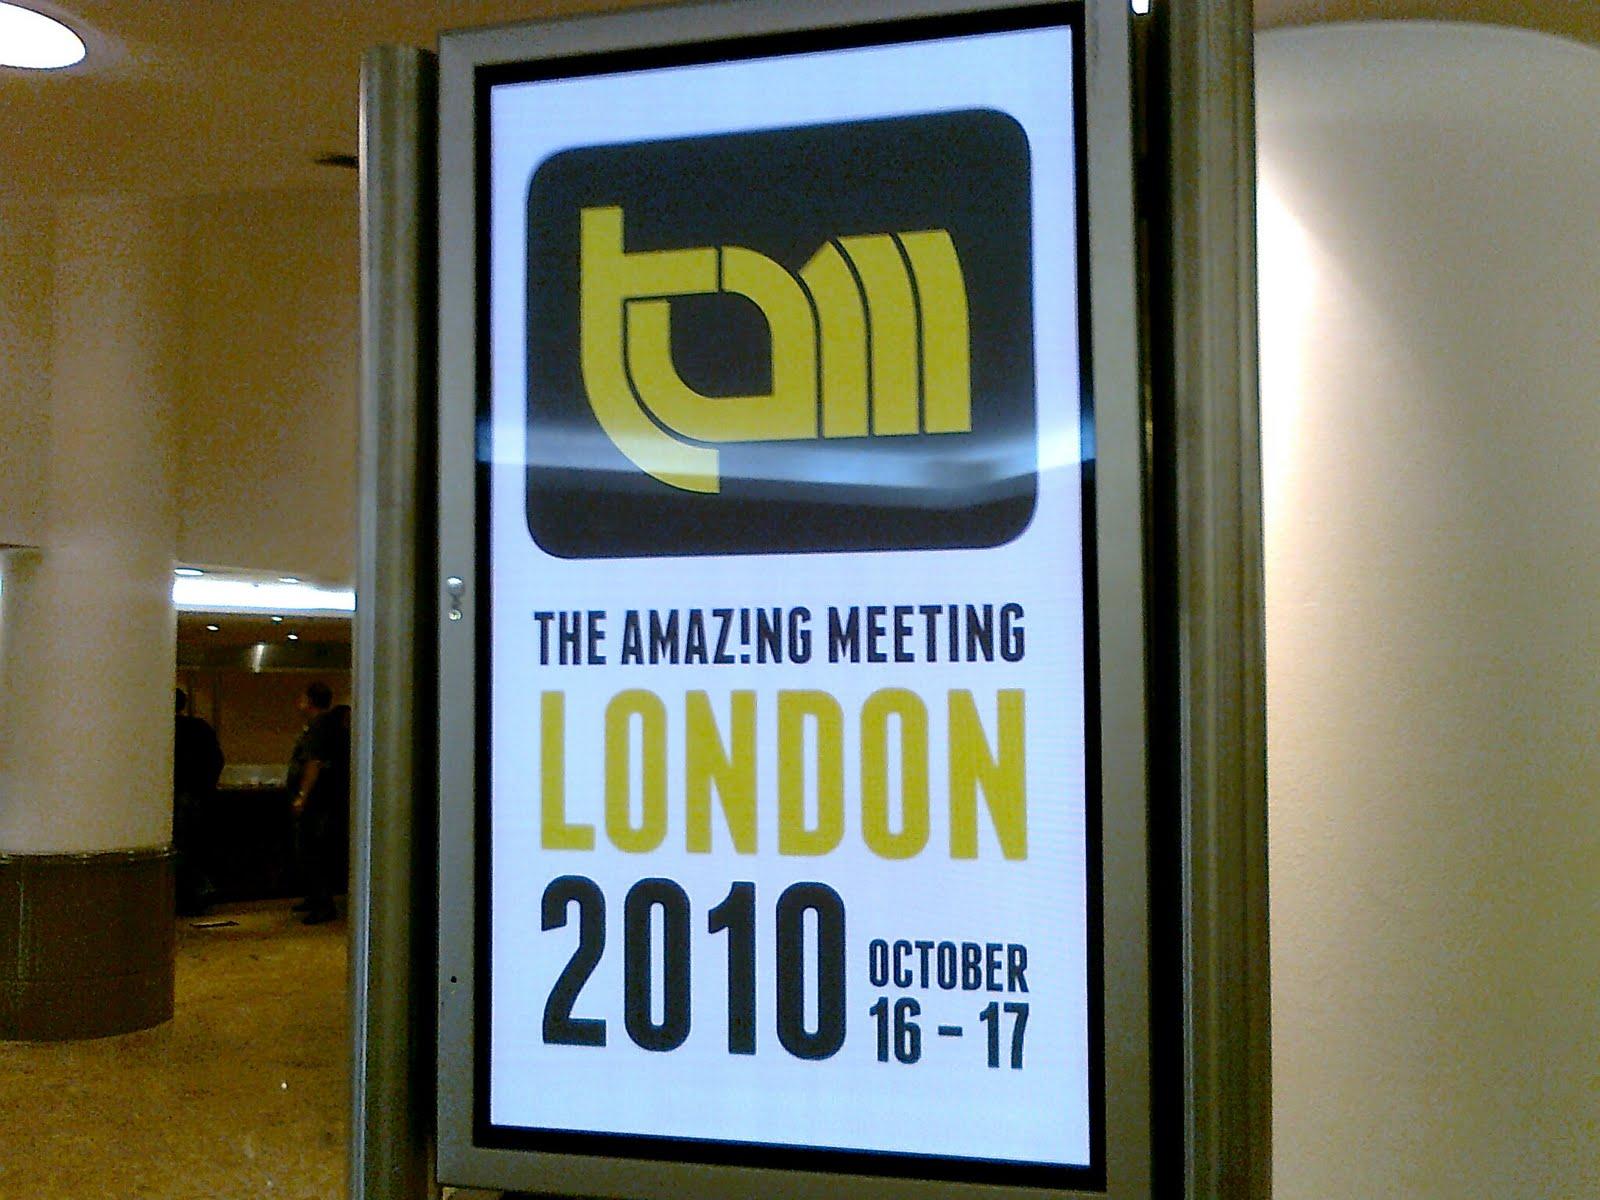 TAM London 2010